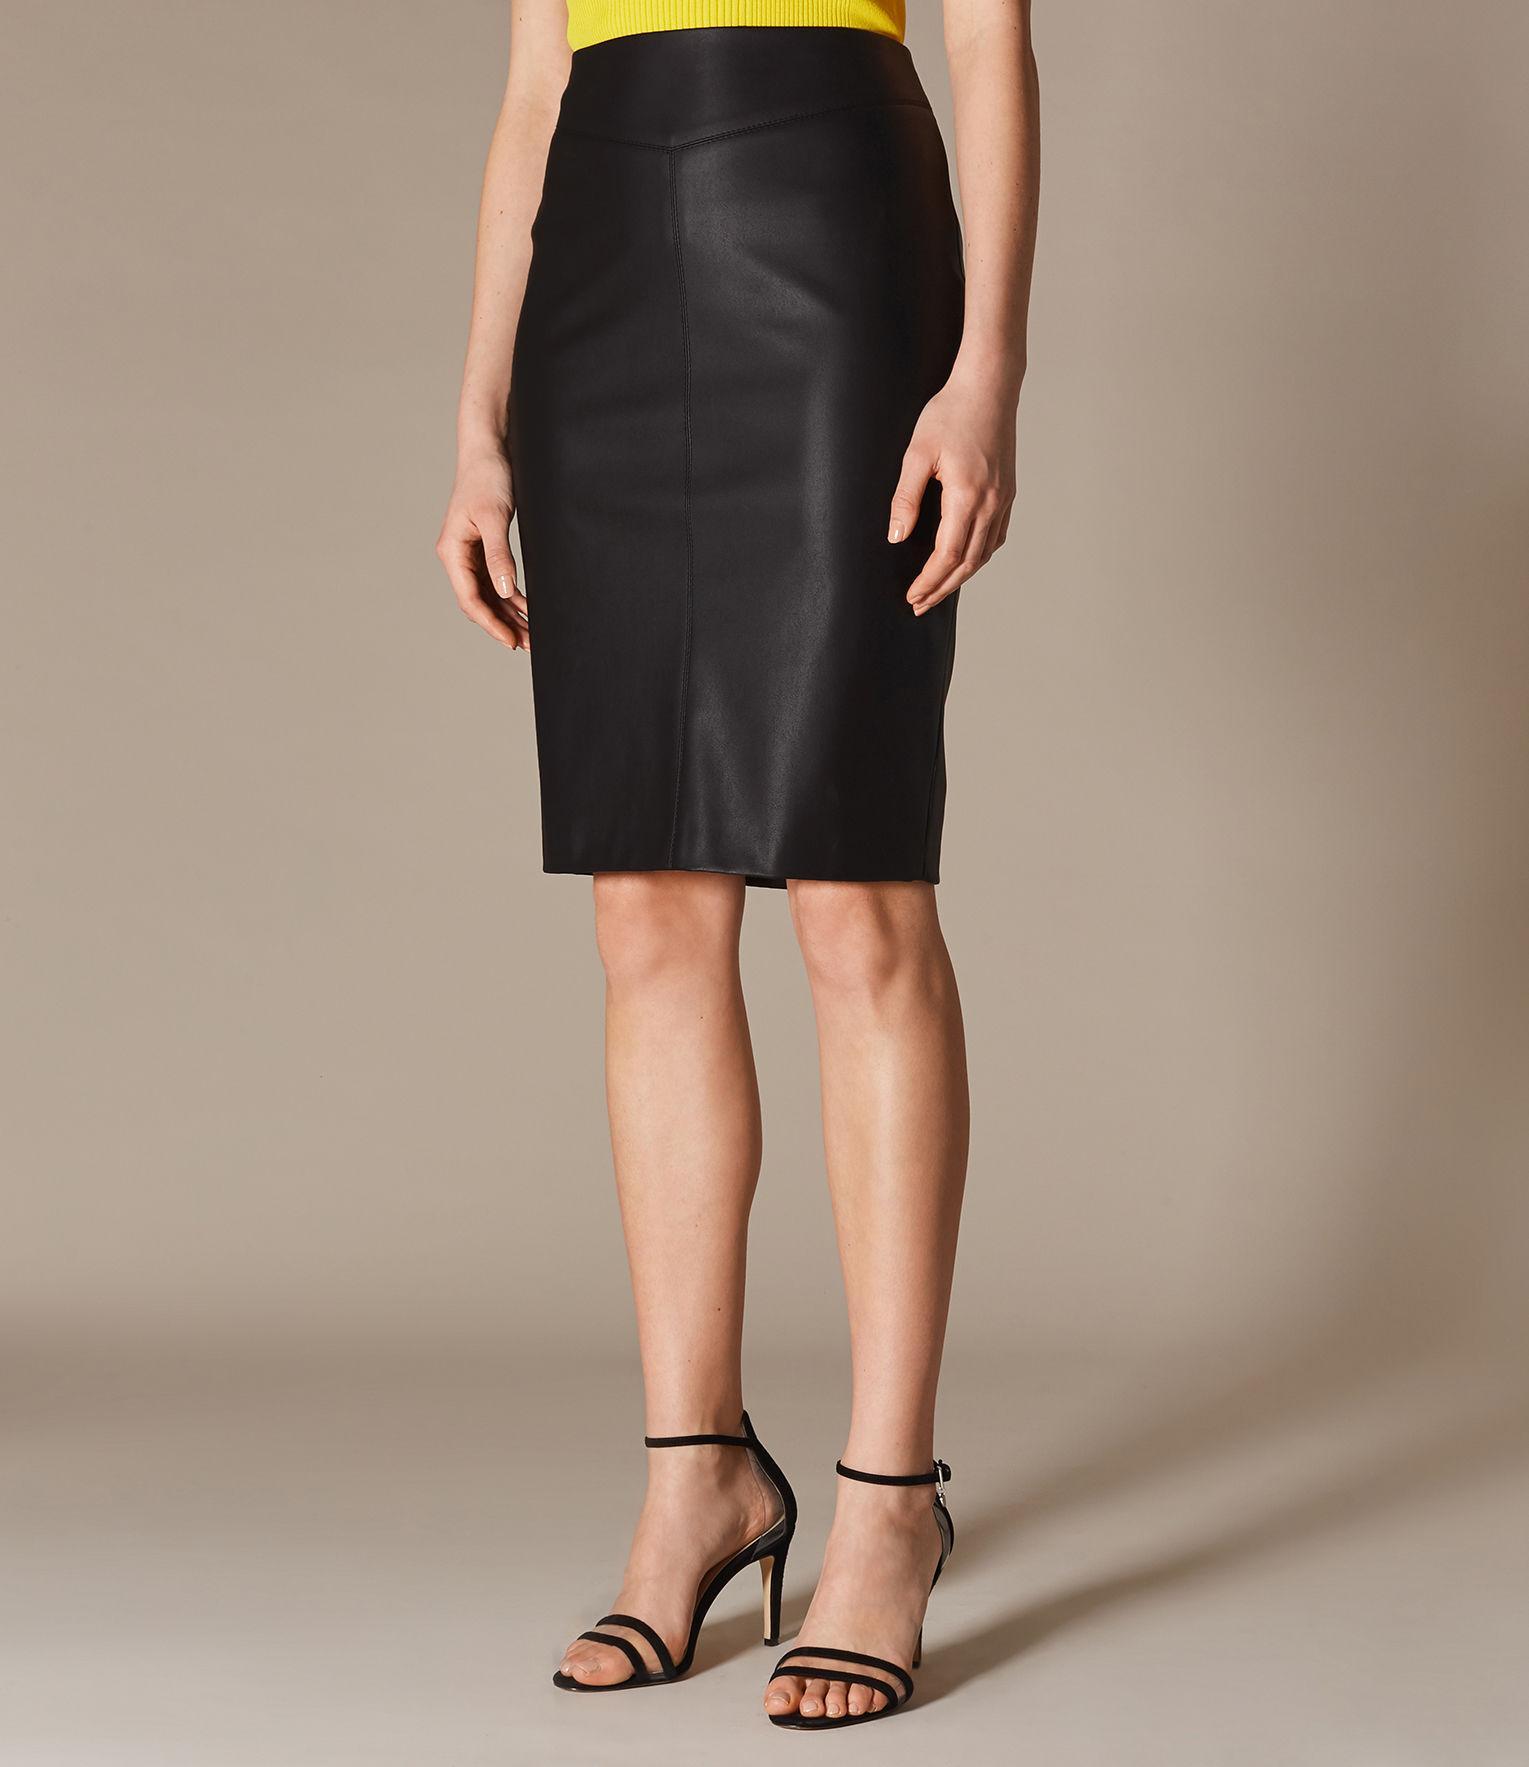 2cd1effe4 Karen Millen - Black Faux Leather Skirt - Lyst. View fullscreen